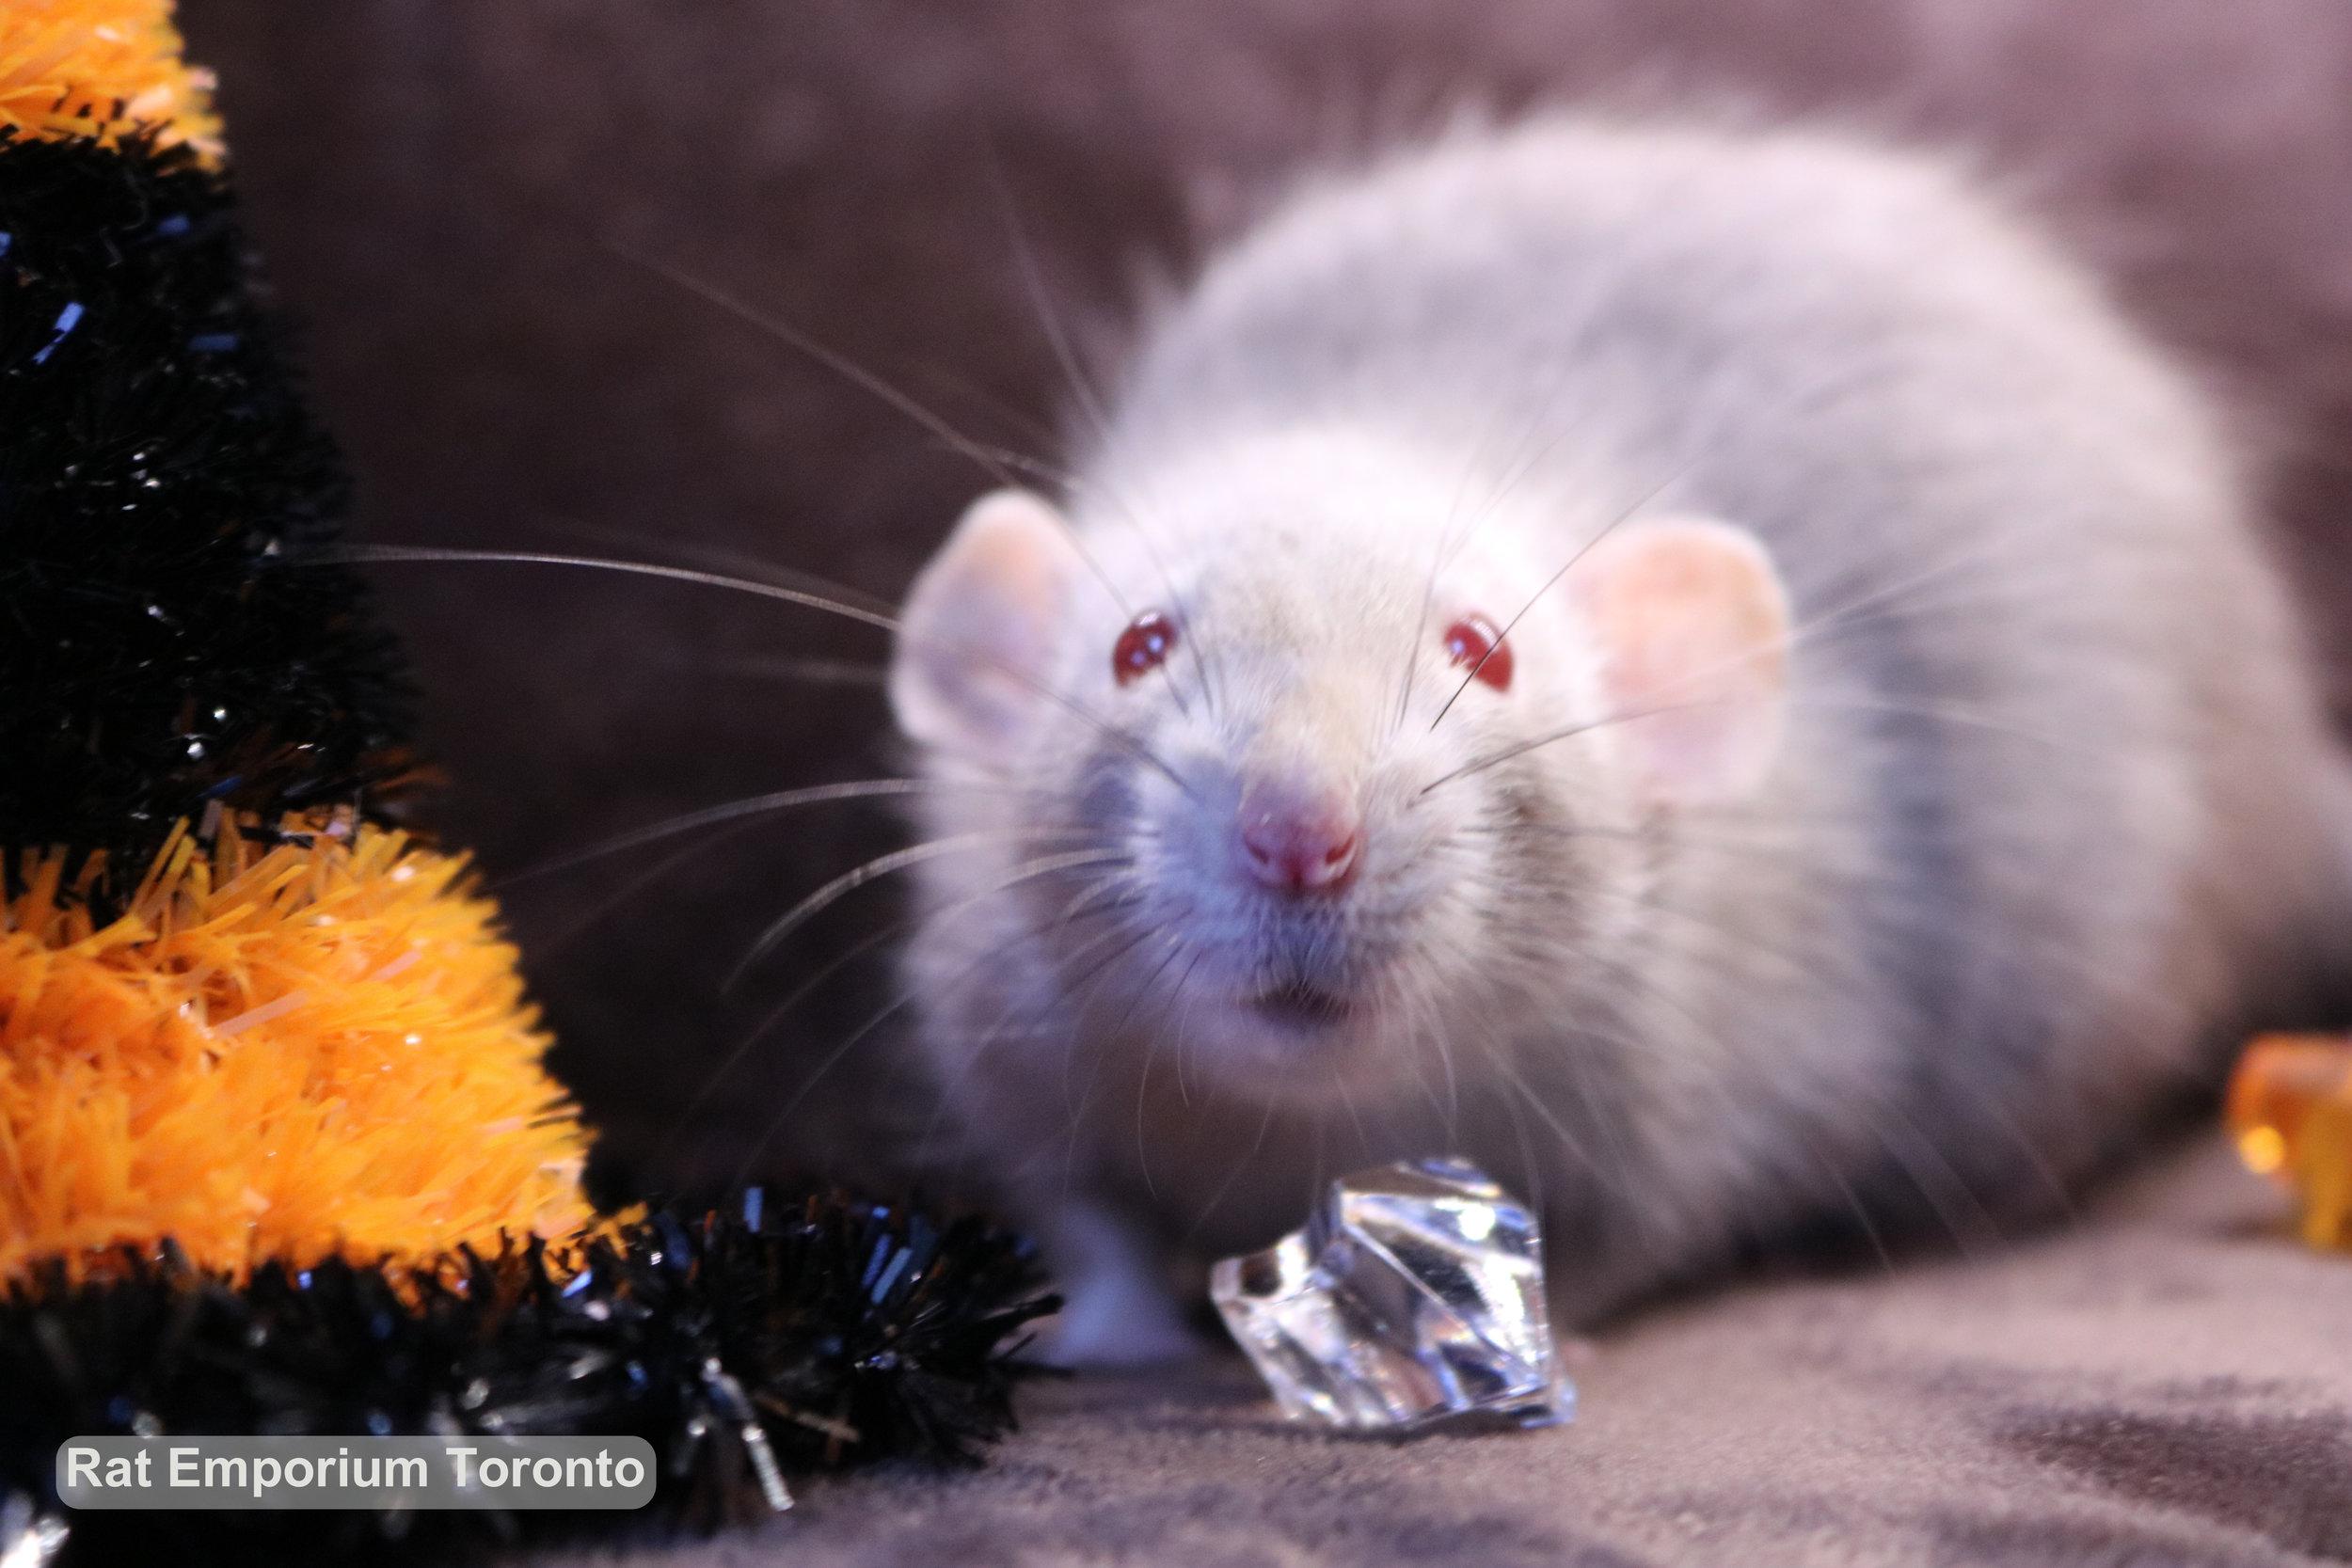 female red eyed marten dumbo rat - rat emporium Toronto - adopt pet rats Toronto - rat breeder